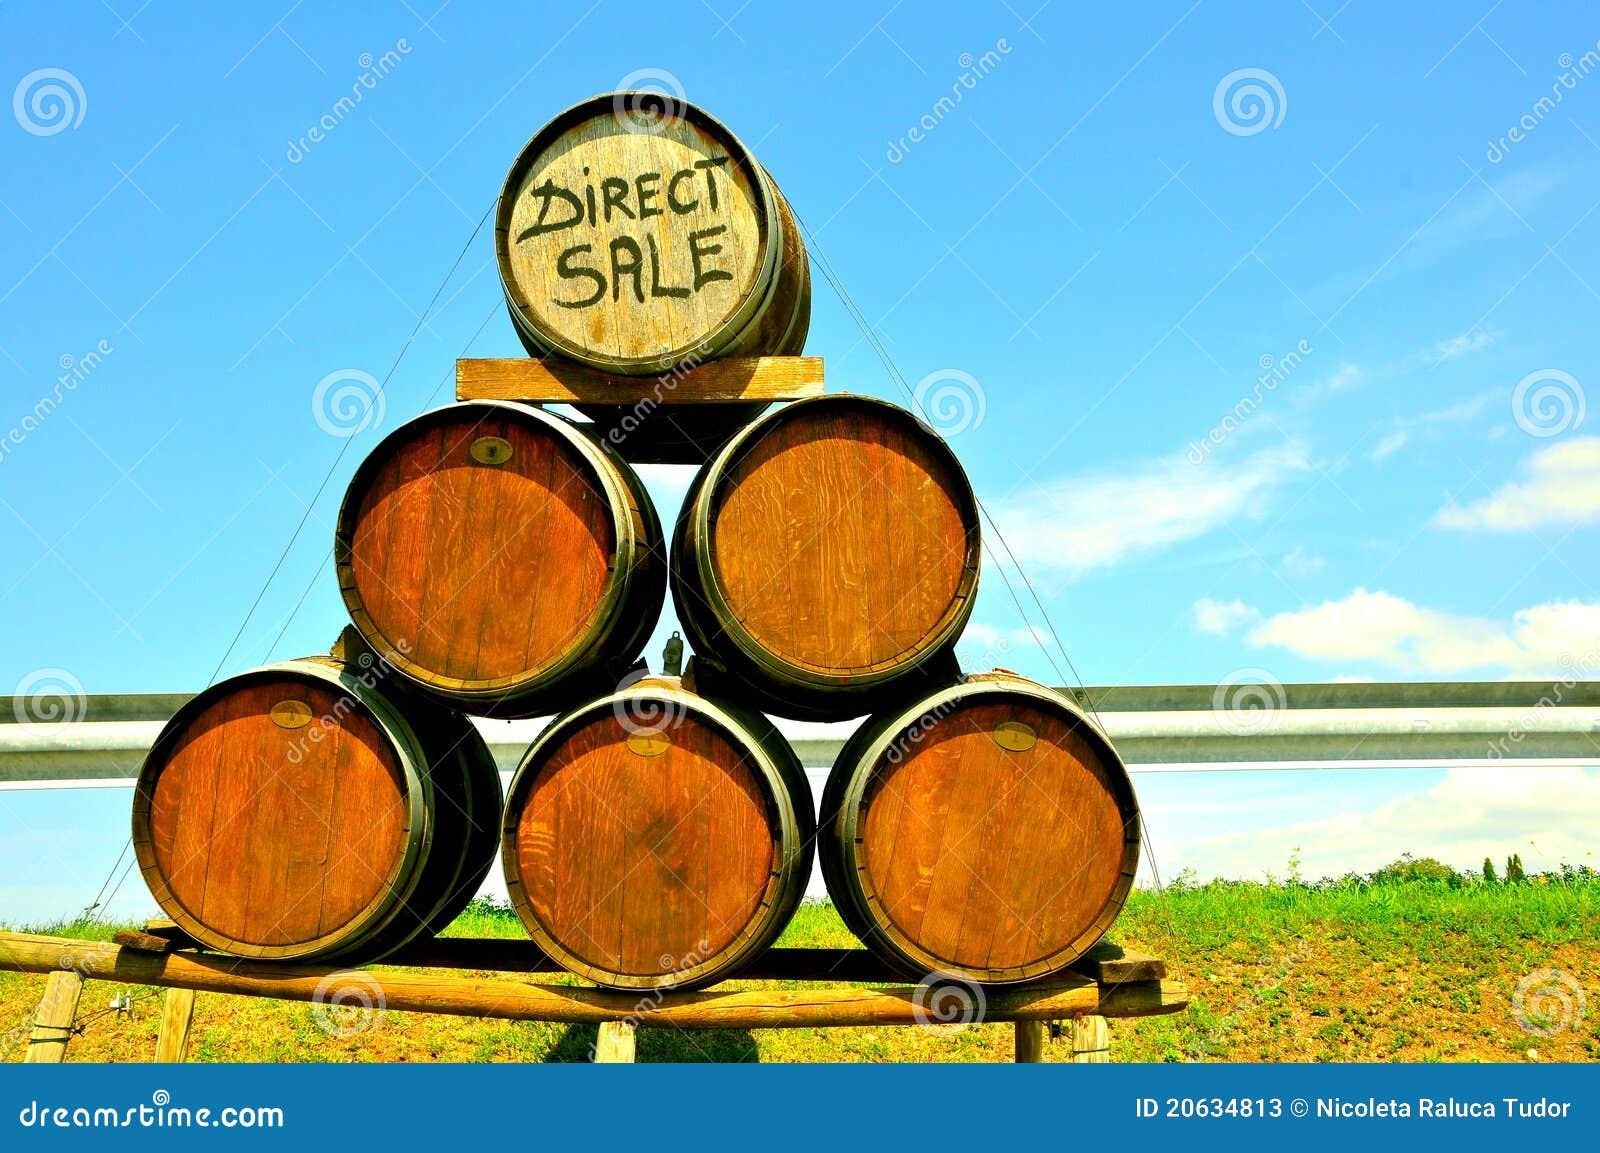 Vente directe de vin en Italie